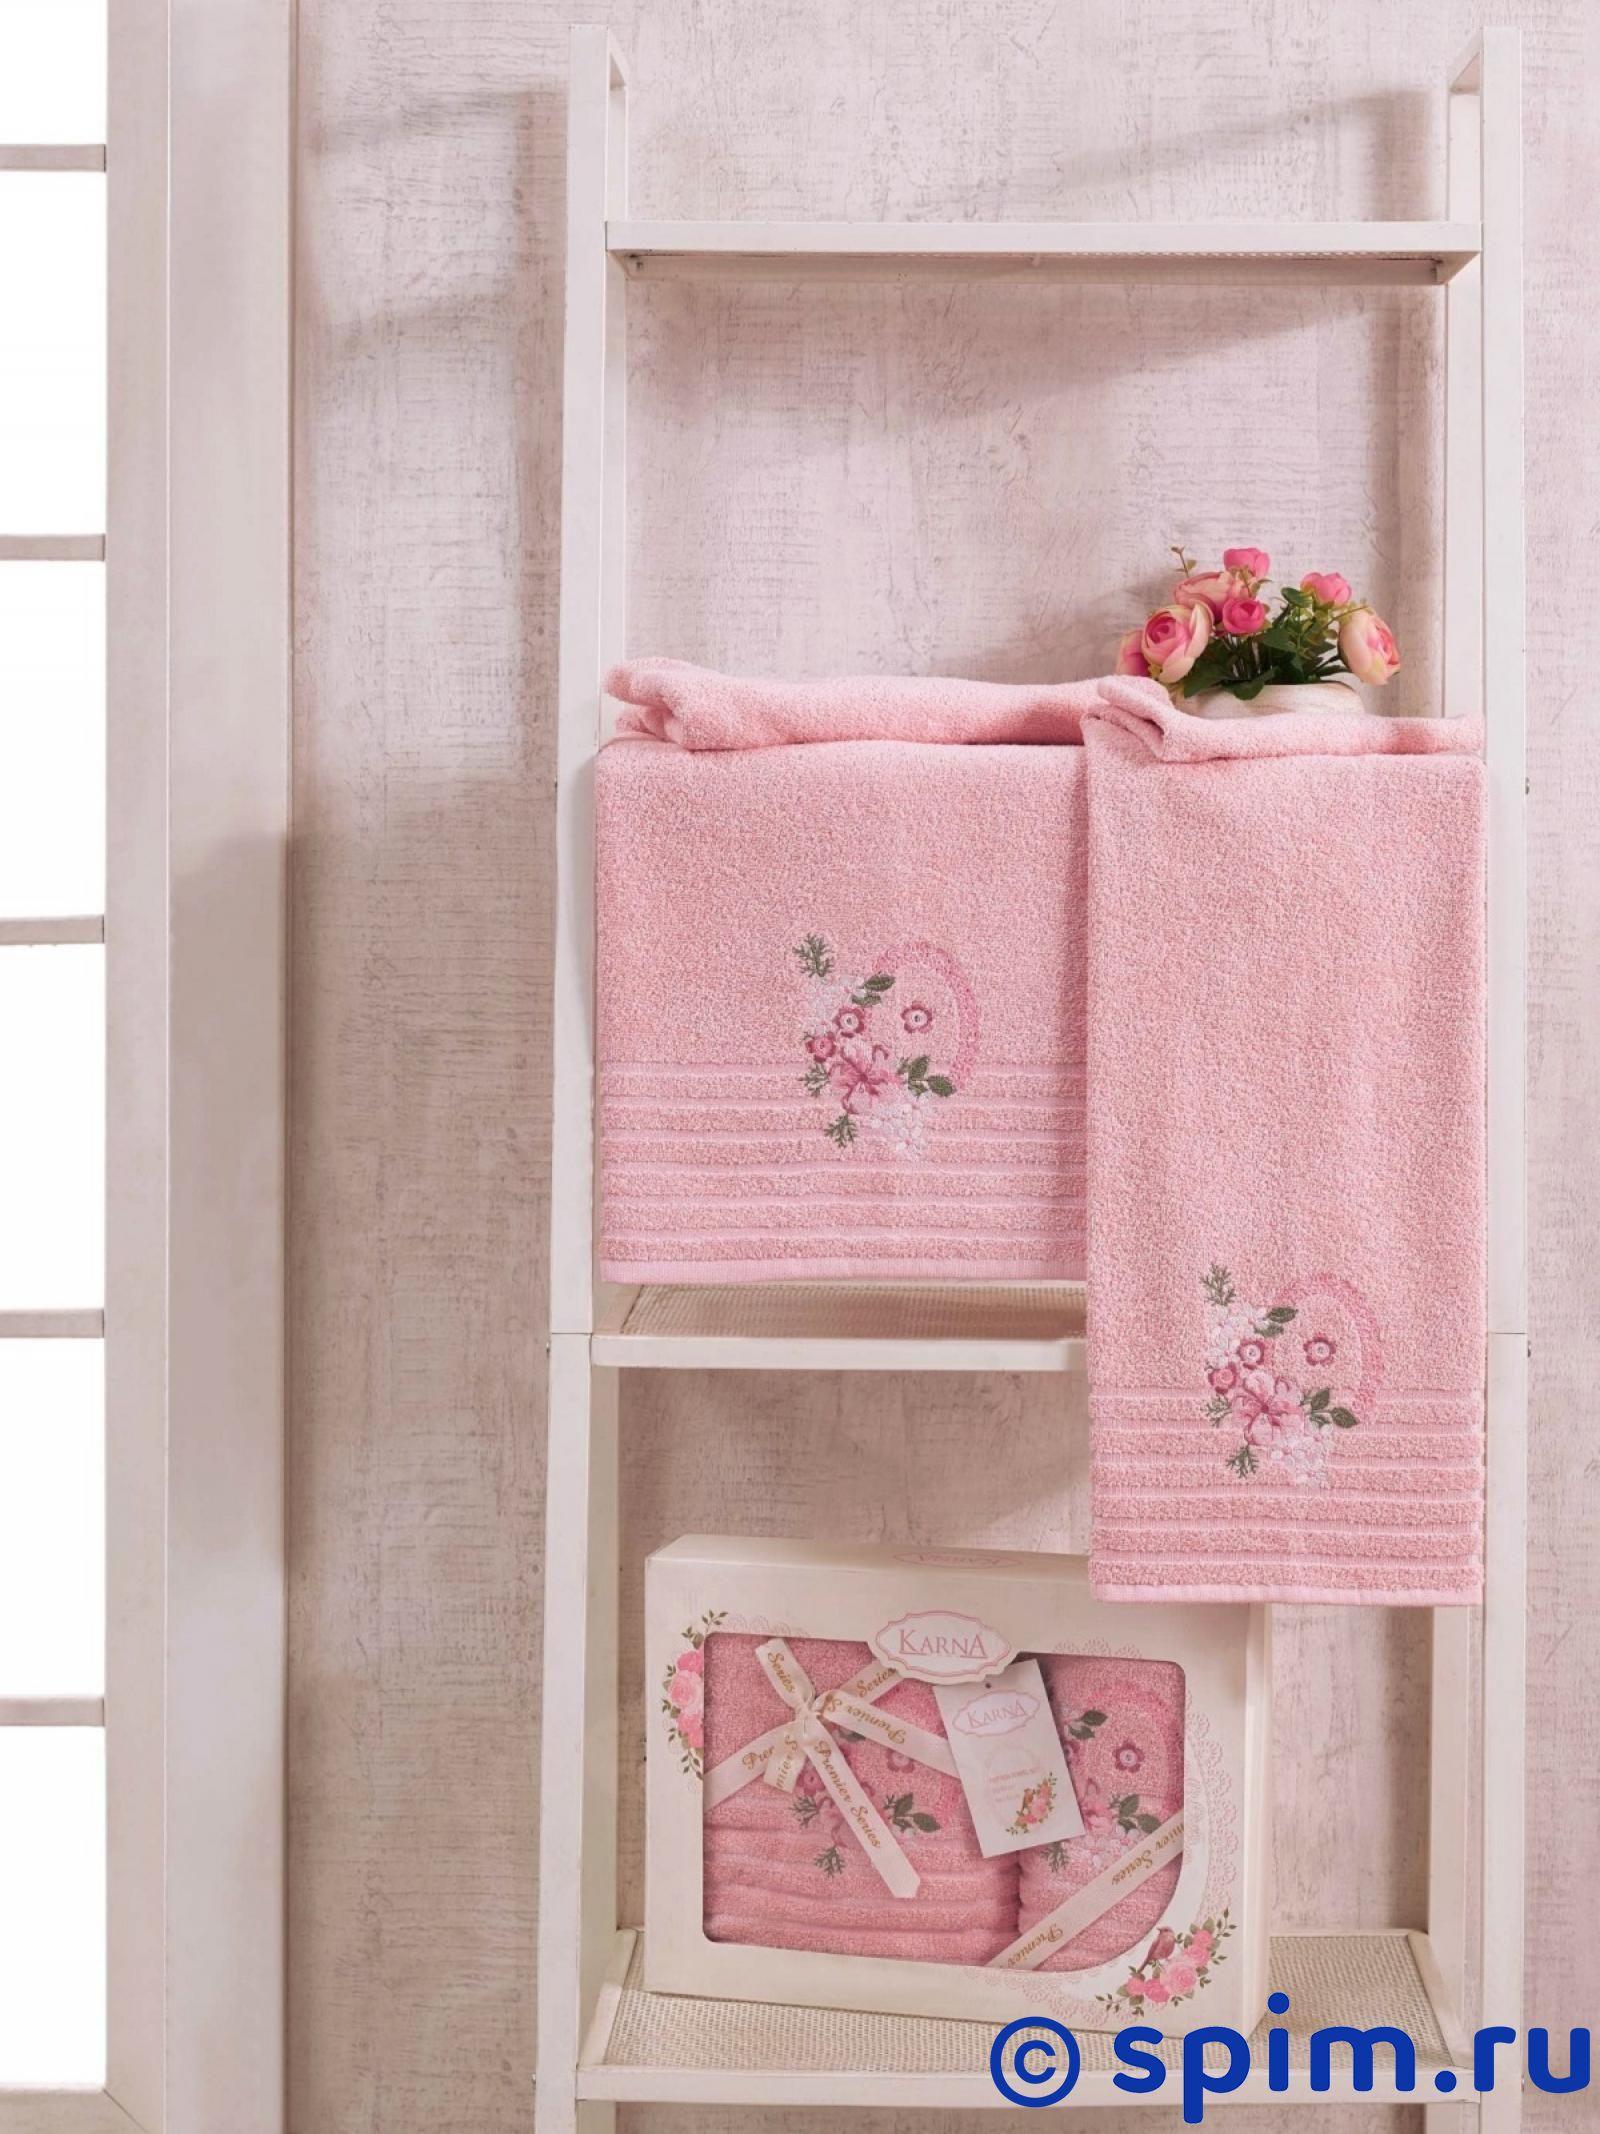 Комплект полотенец Karna Camile, пудра покрывало karna покрывало evony цвет пудра 240х260 см